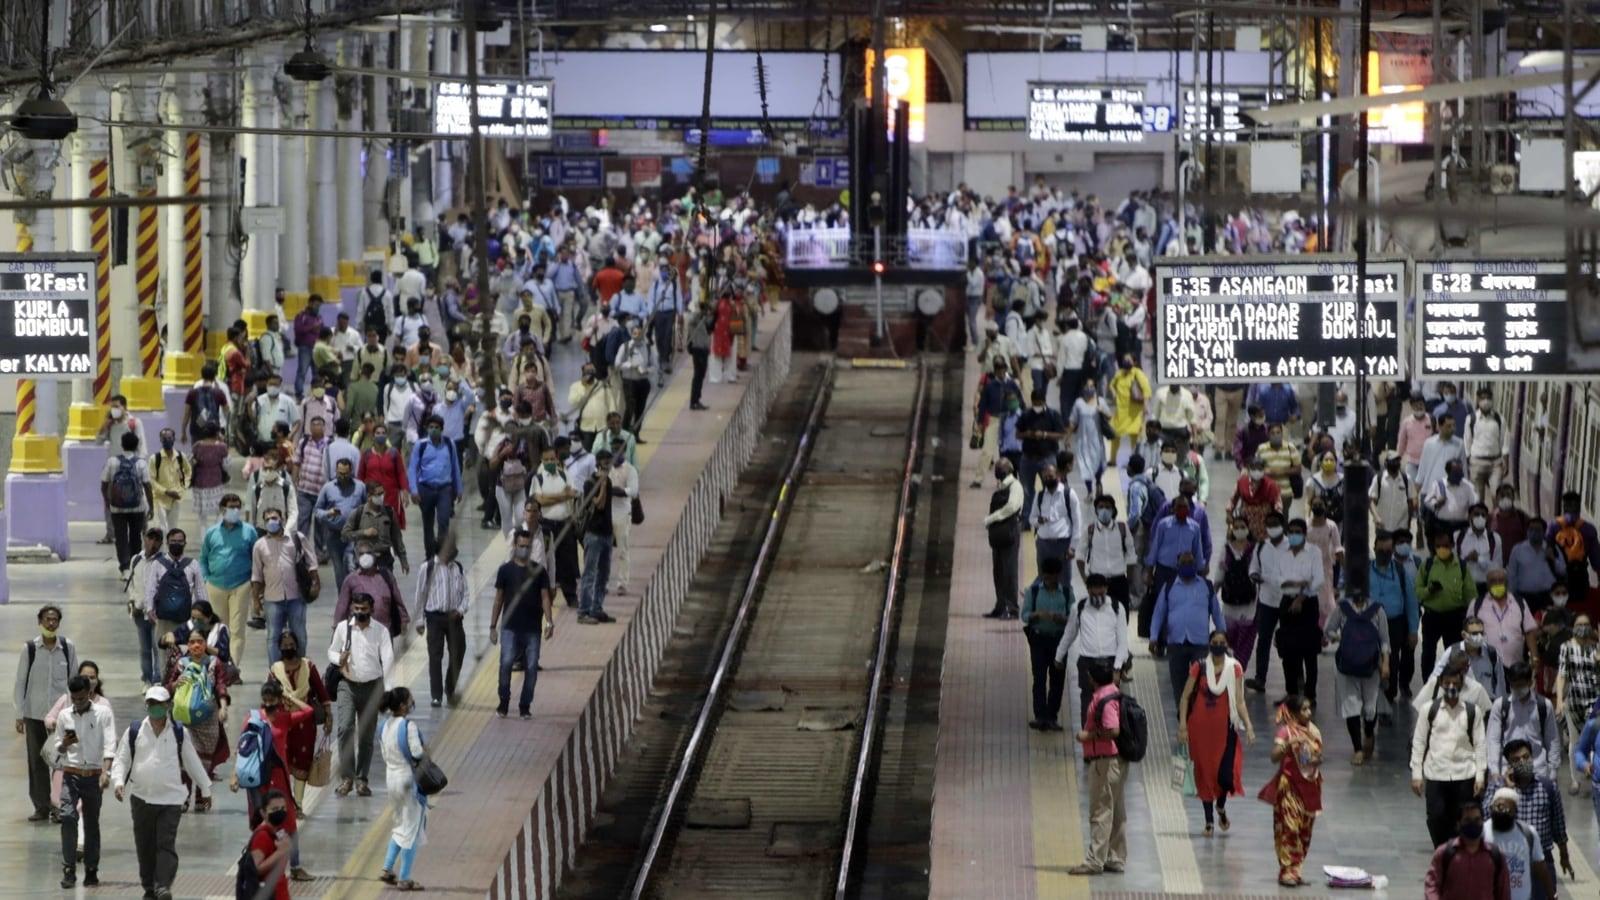 Mumbai's daily Covid-19 daily count crosses 10,000 marks again, Maharashtra records 55,469 new cases in 24 hours